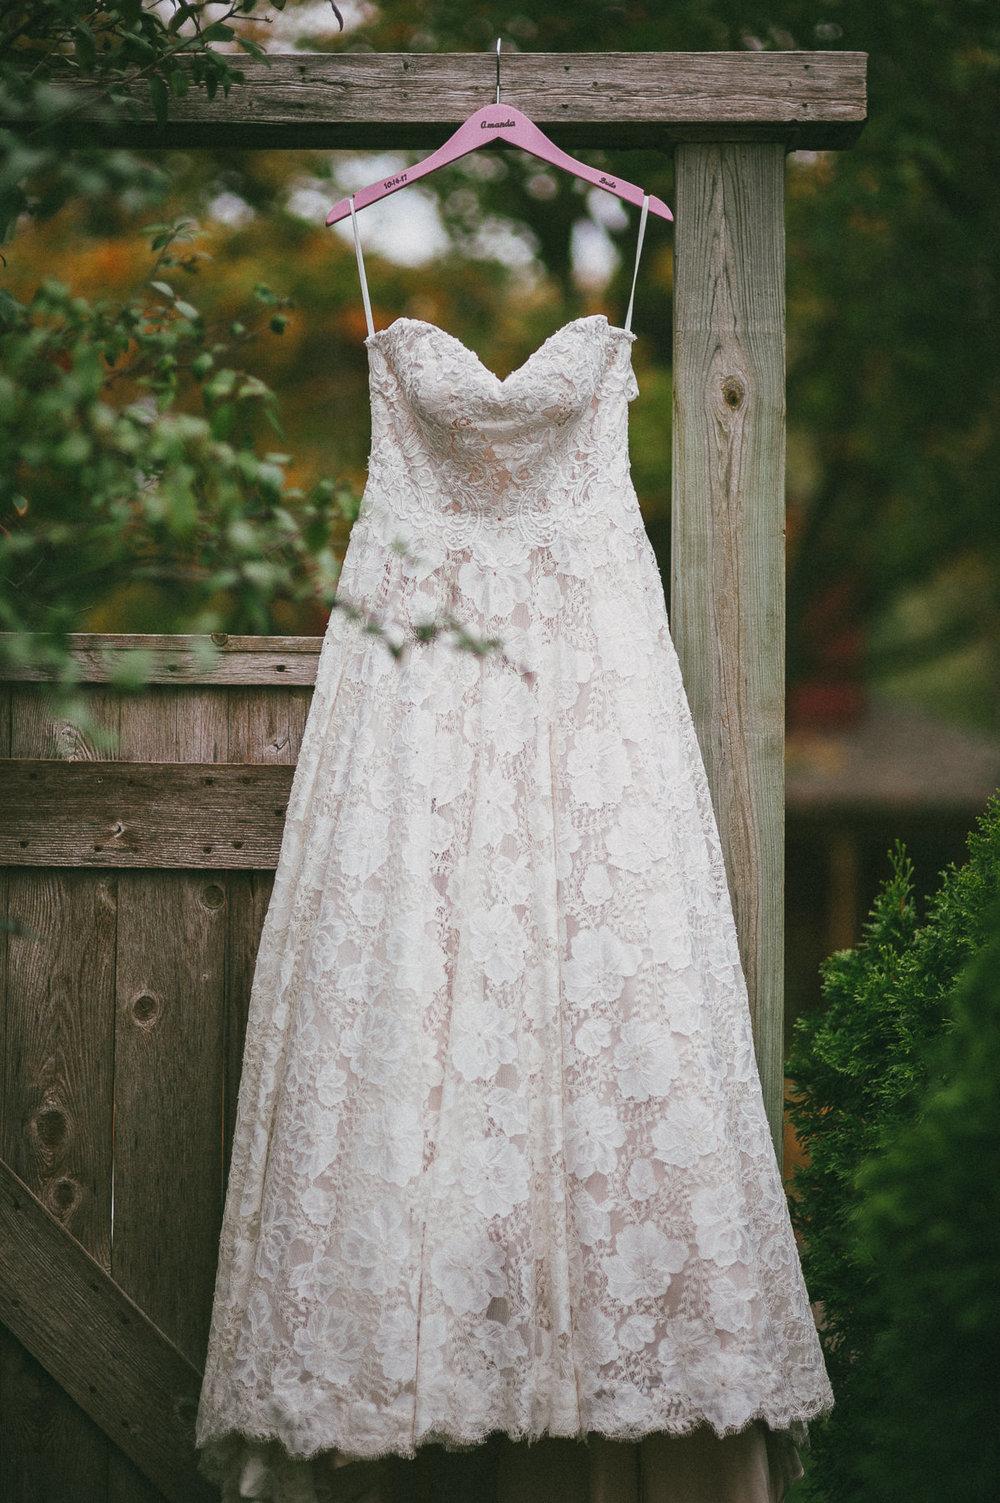 breighton-and-basette-photography-copyrighted-image-blog-amanda-and-eric-wedding-041.jpg